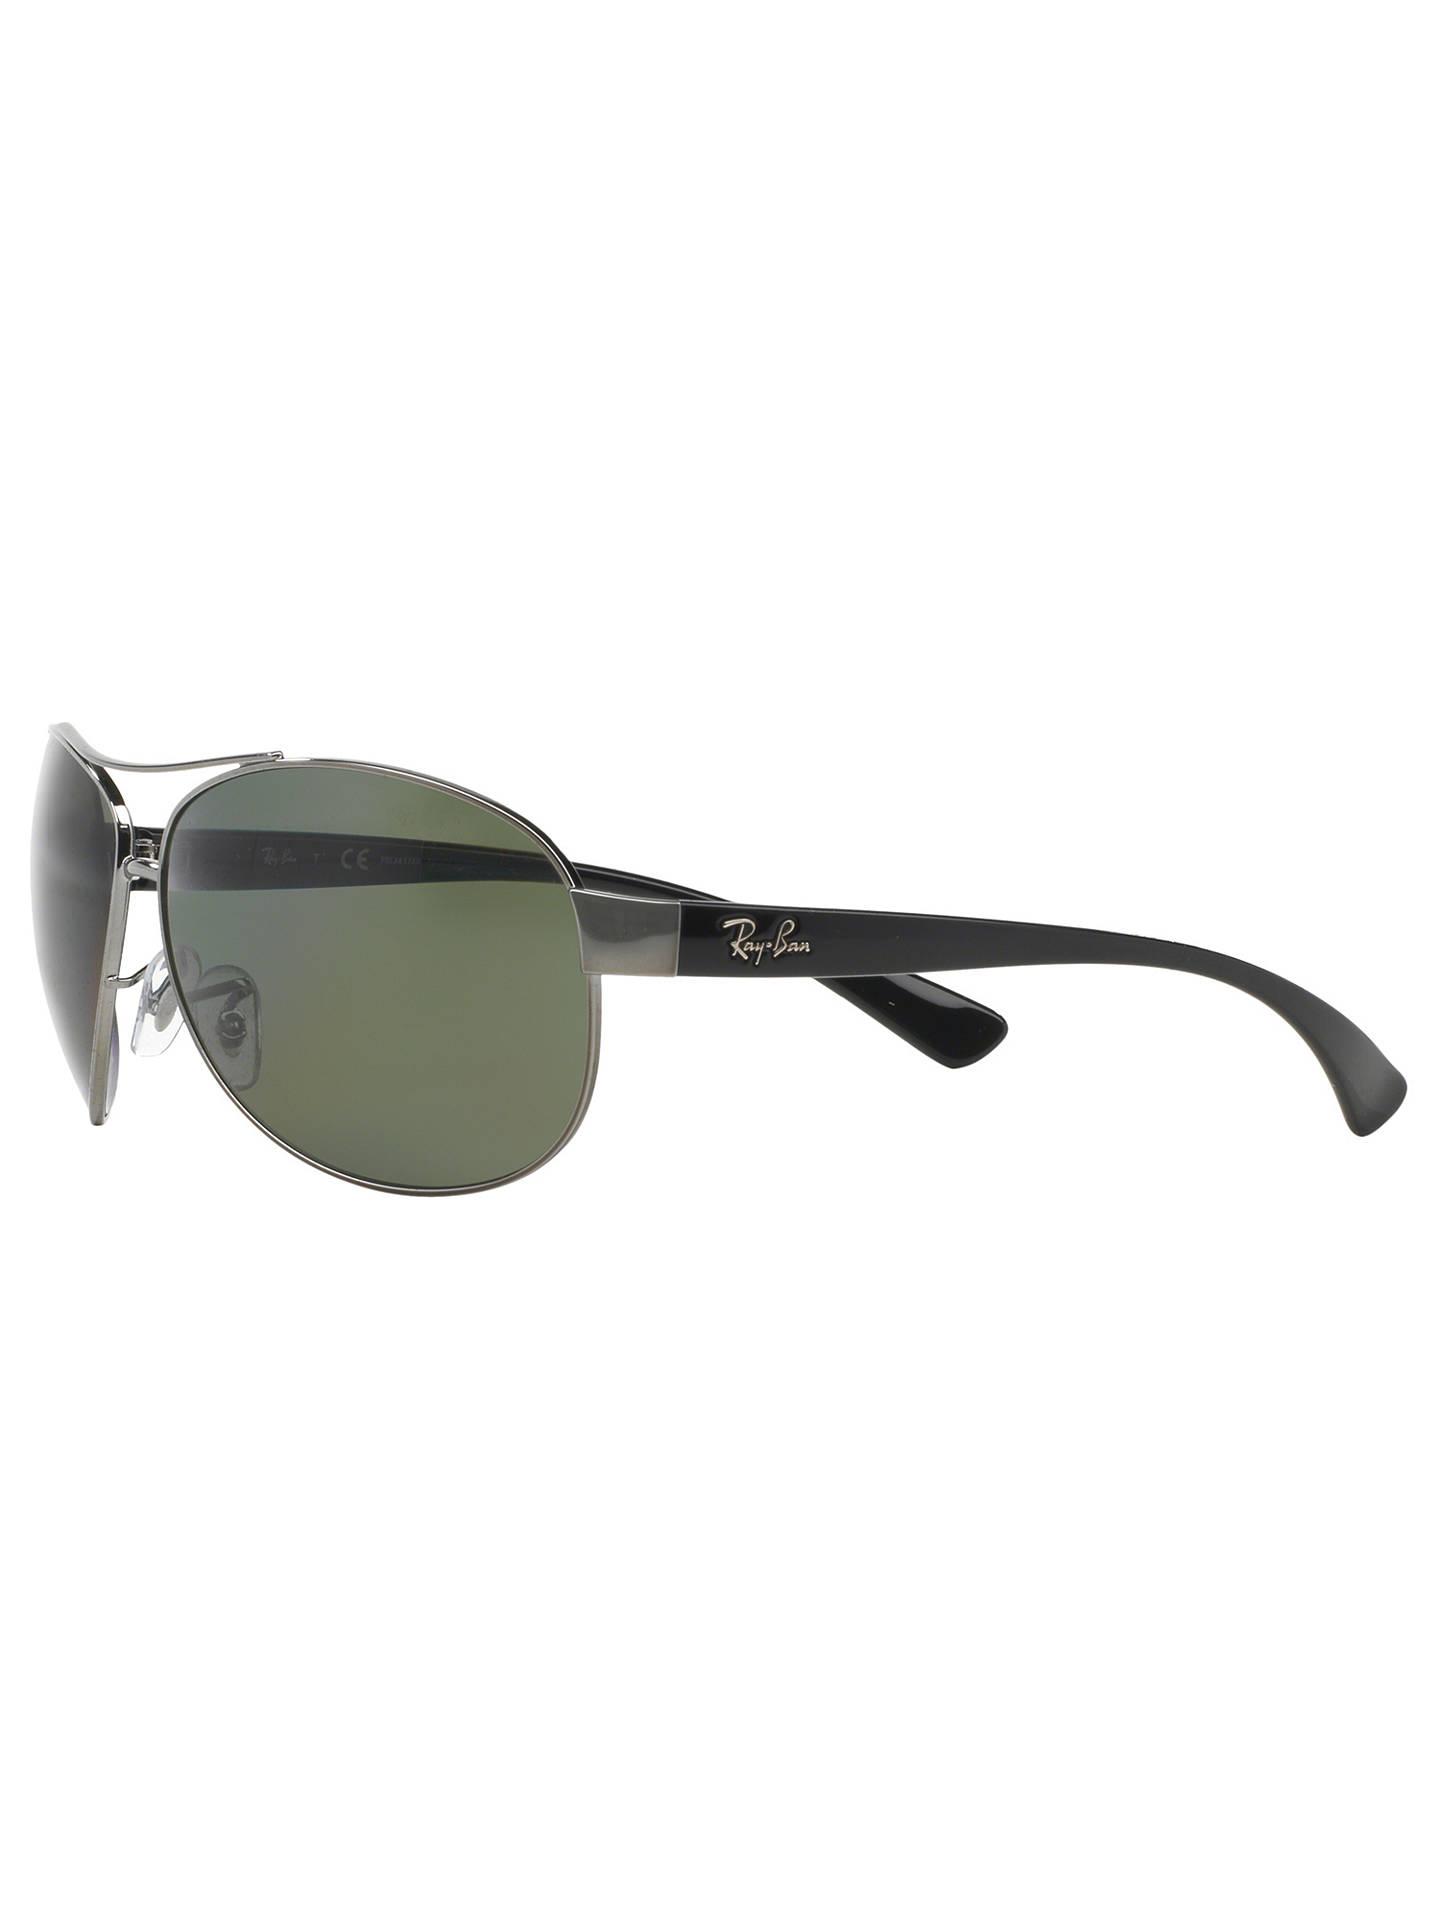 22b87e96c6 ... BuyRay-Ban RB3386 Polarised Oval Aviator Sunglasses